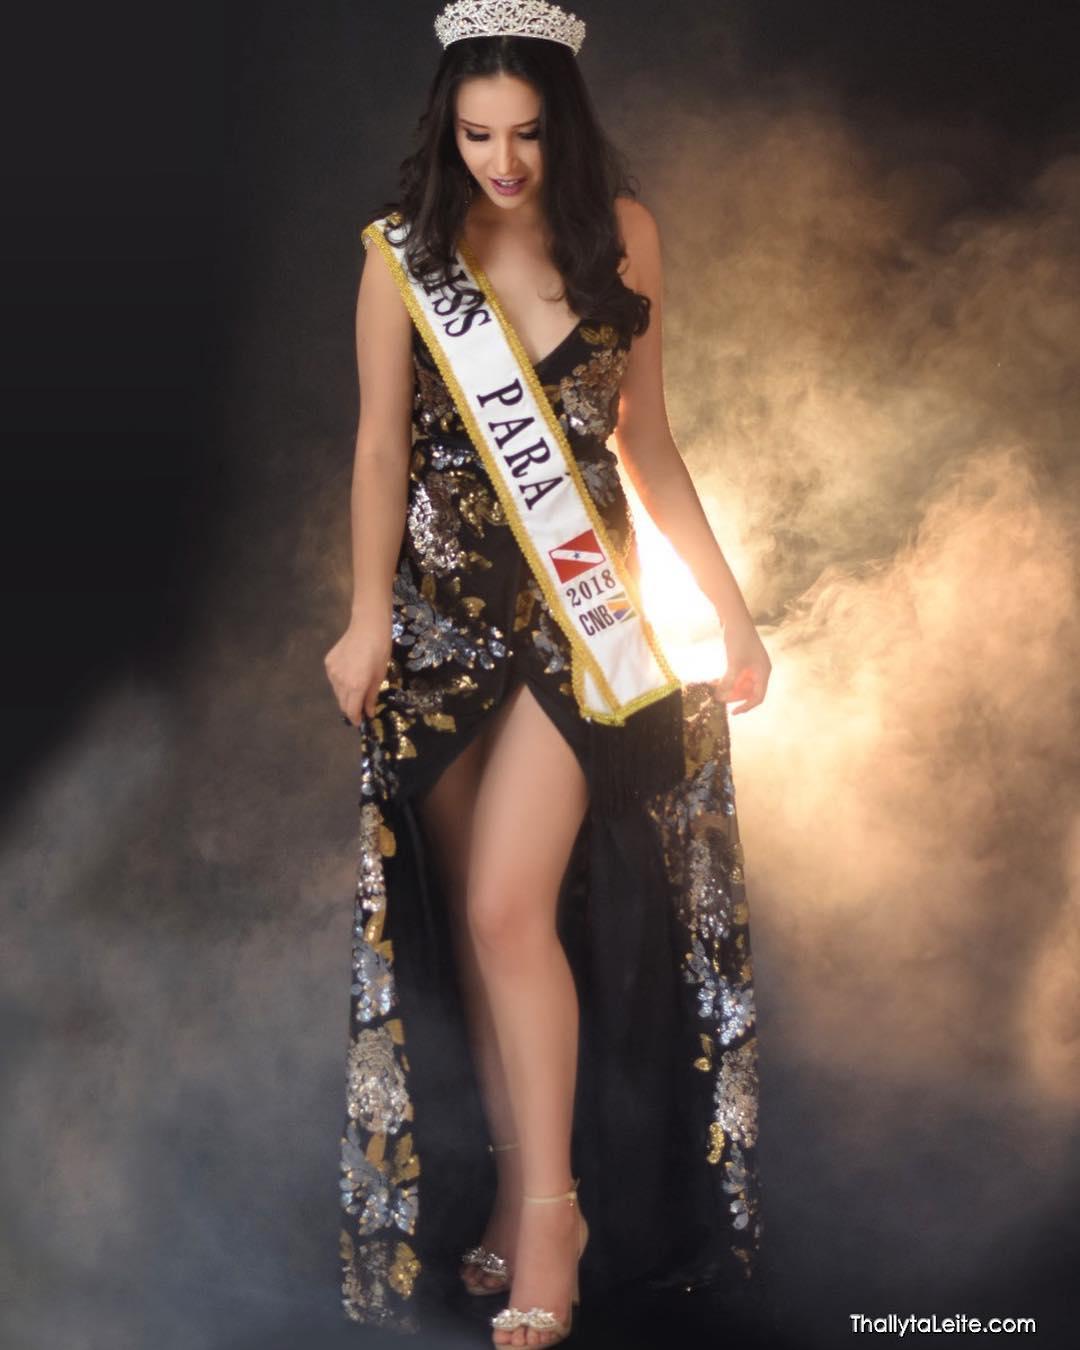 isabella garcia, top 8 de miss brasil mundo 2018/top 20 de miss brasil mundo 2019. - Página 2 35948710